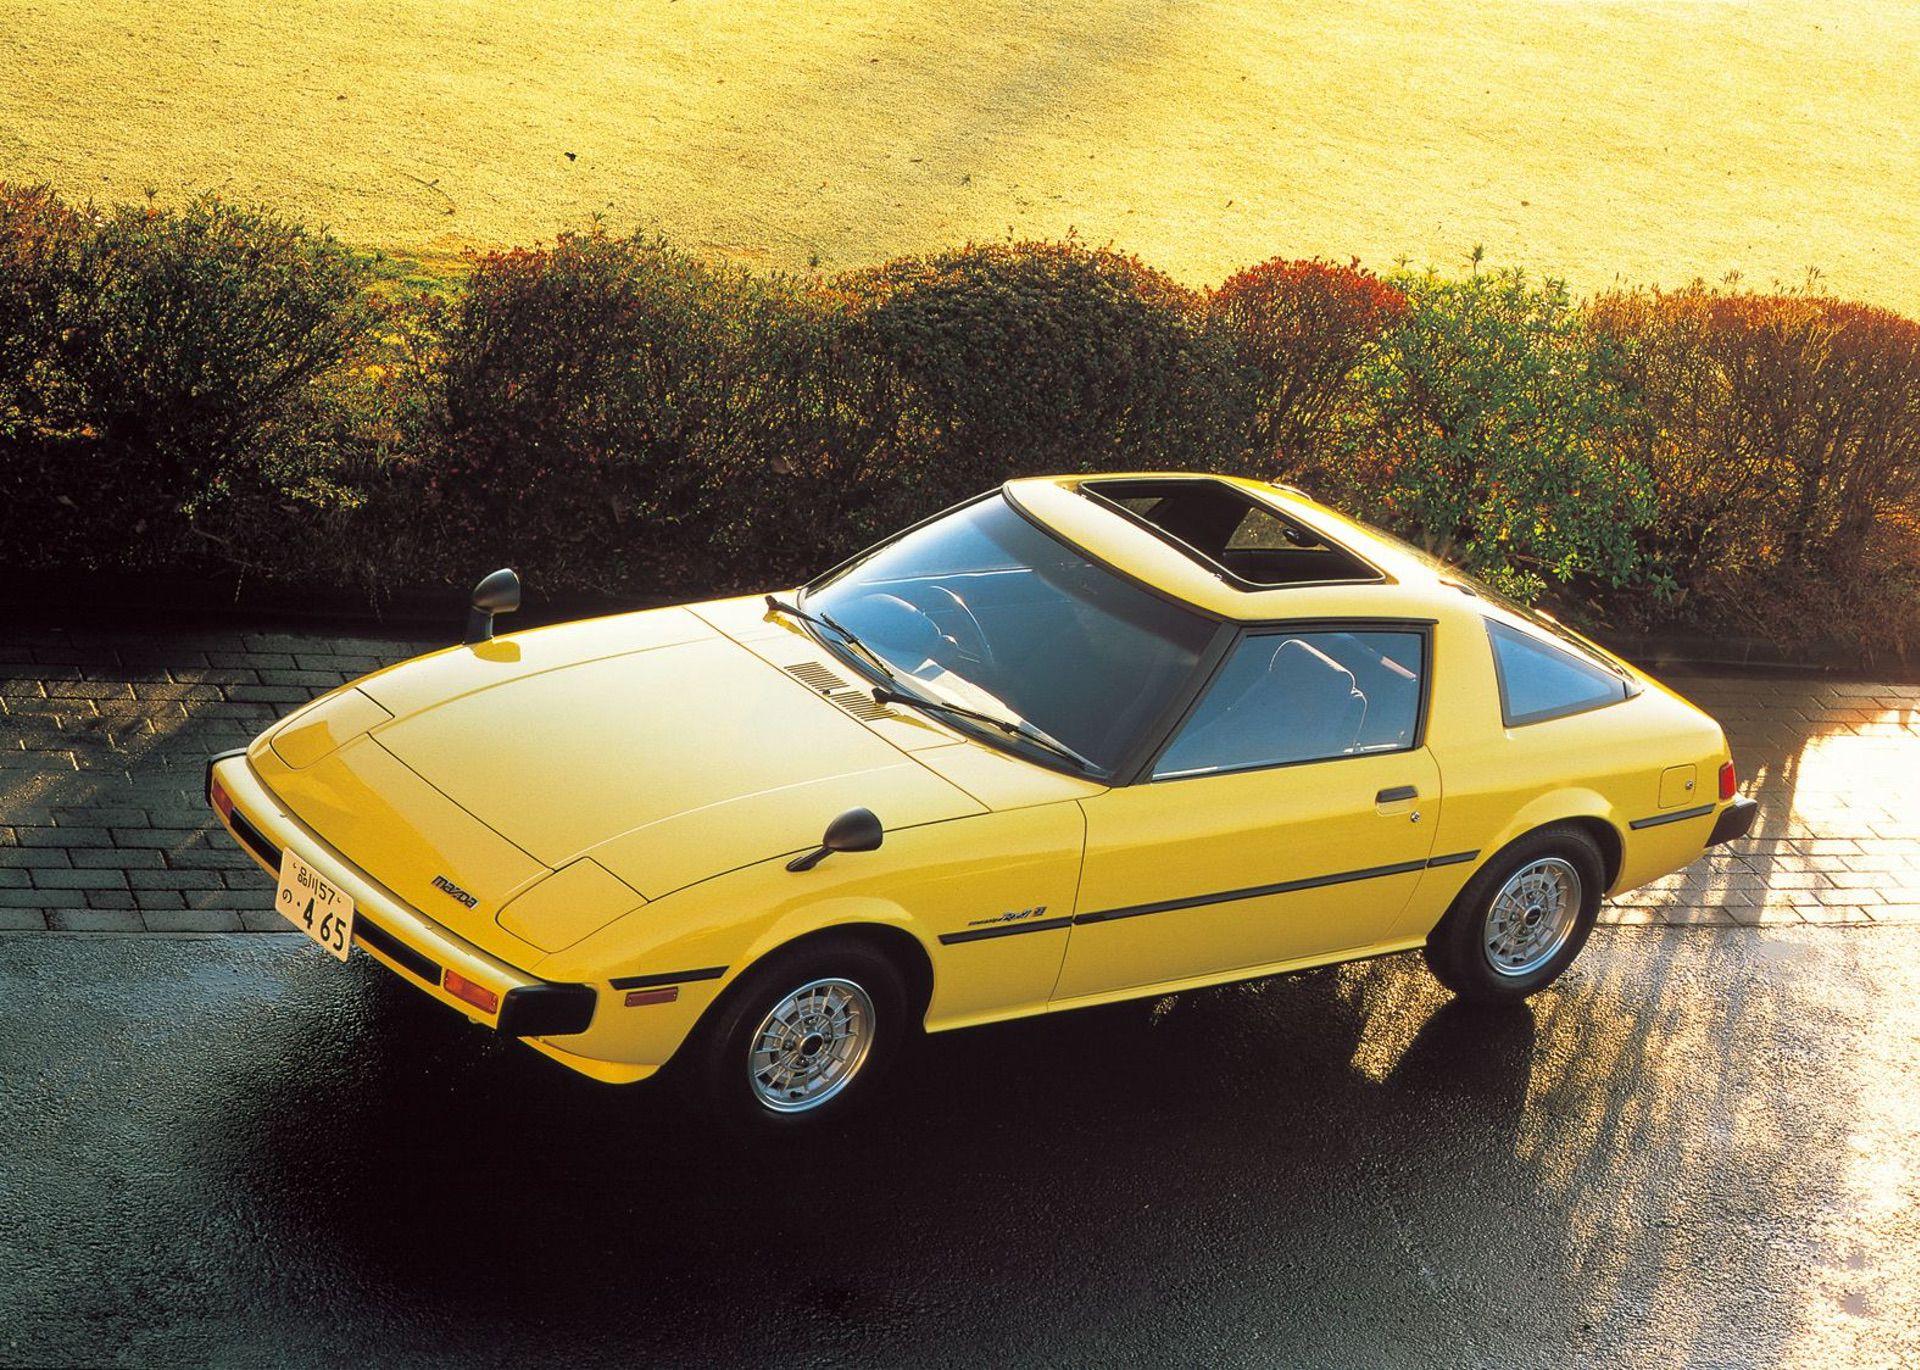 Mazda_RX-7_history_0081